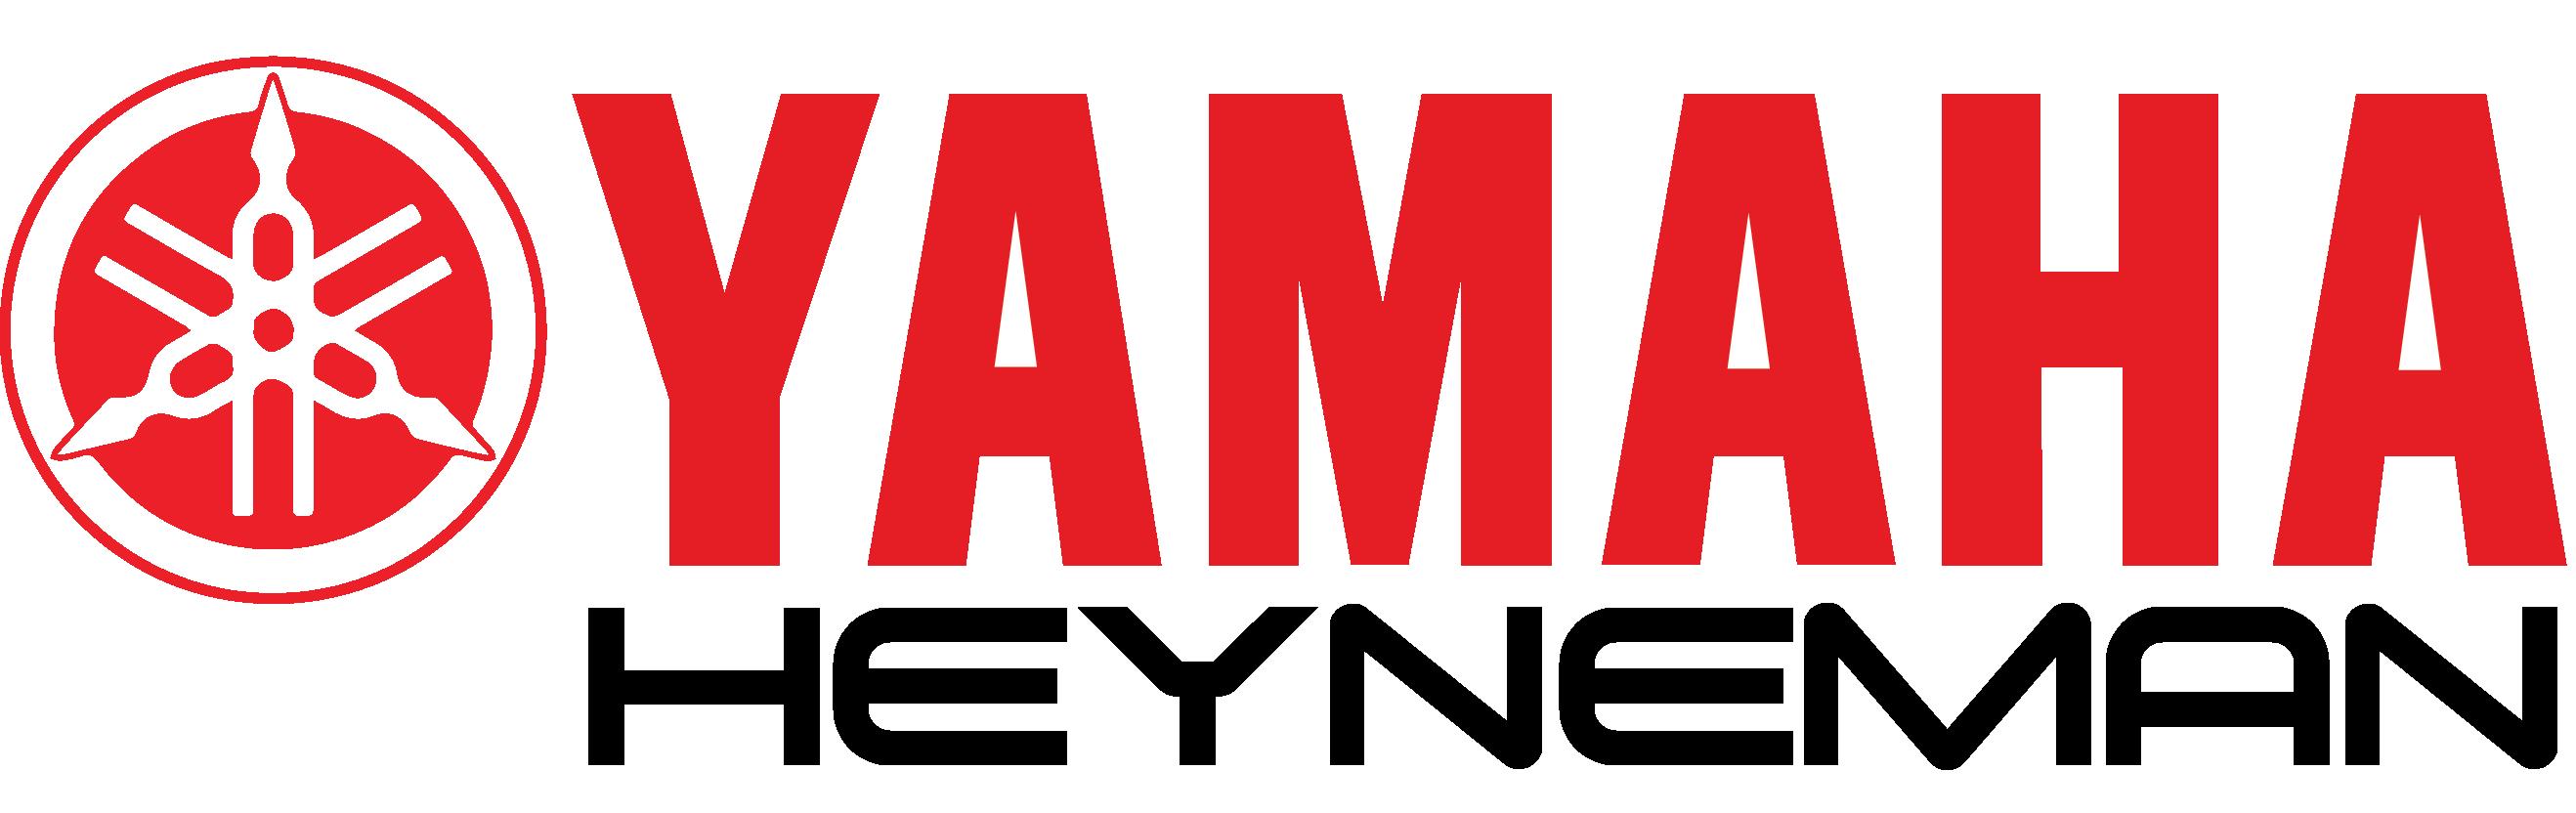 Heyneman Yamaha